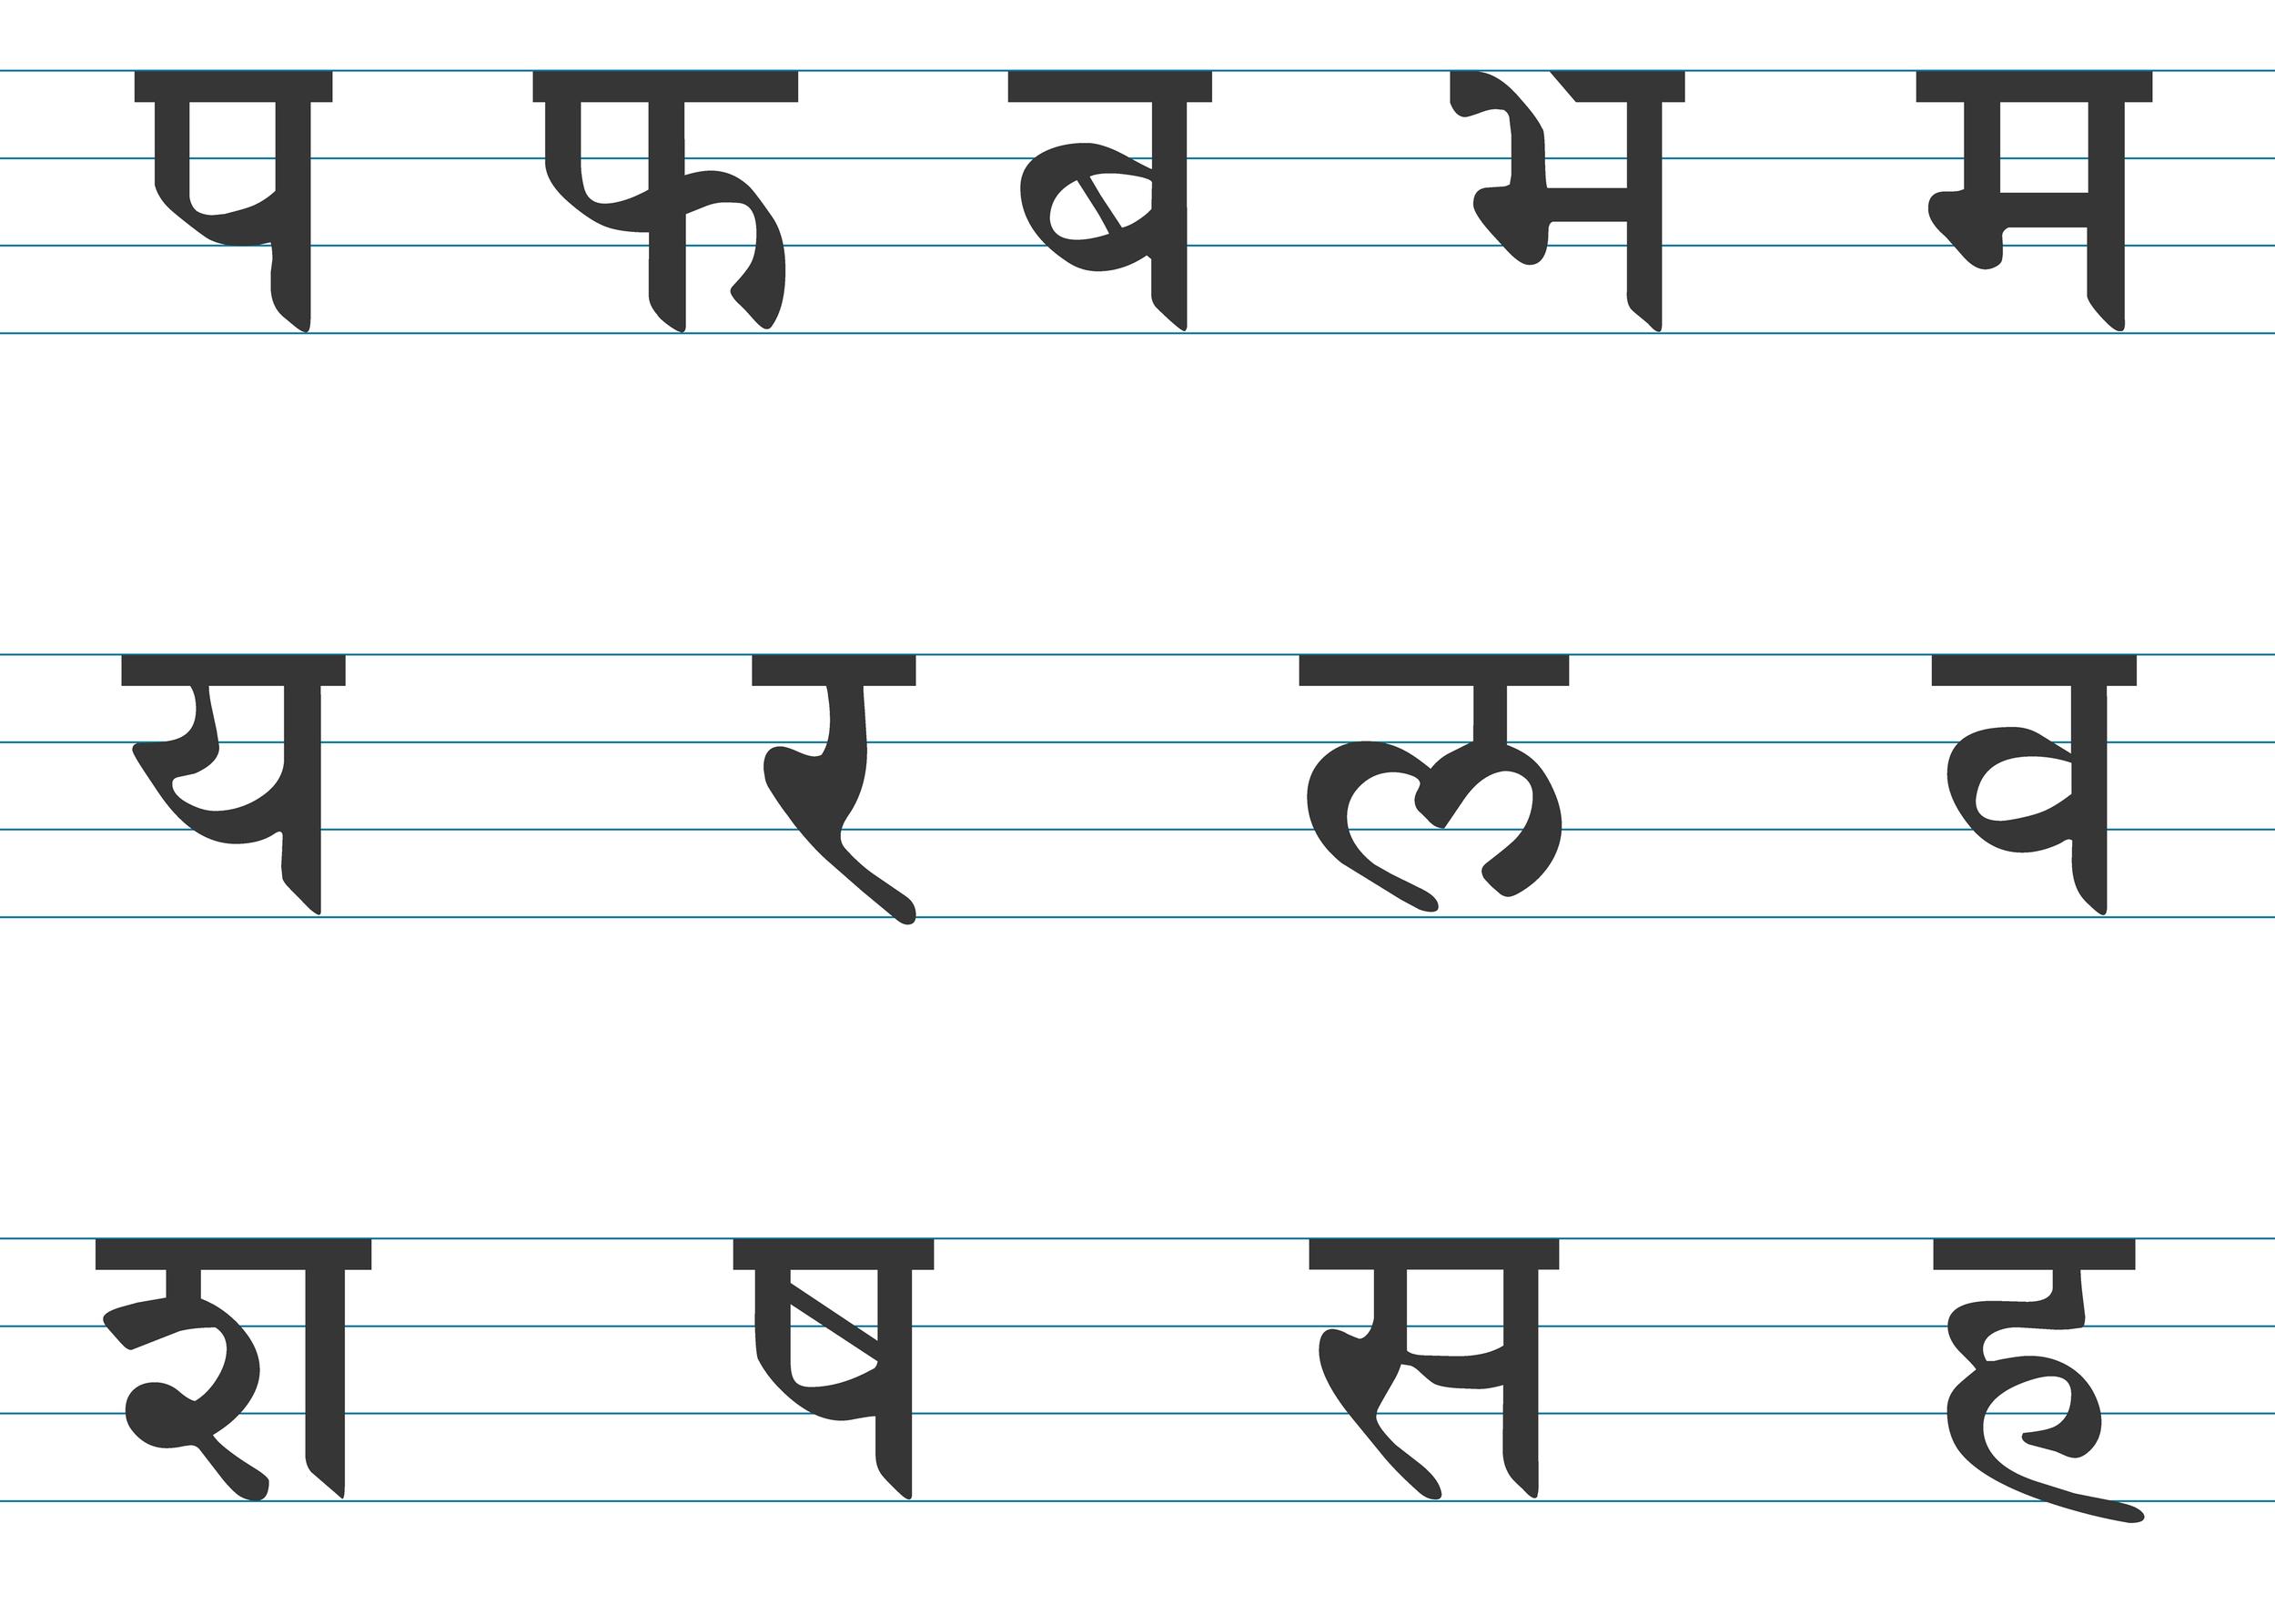 5A1-writing-consonants.png